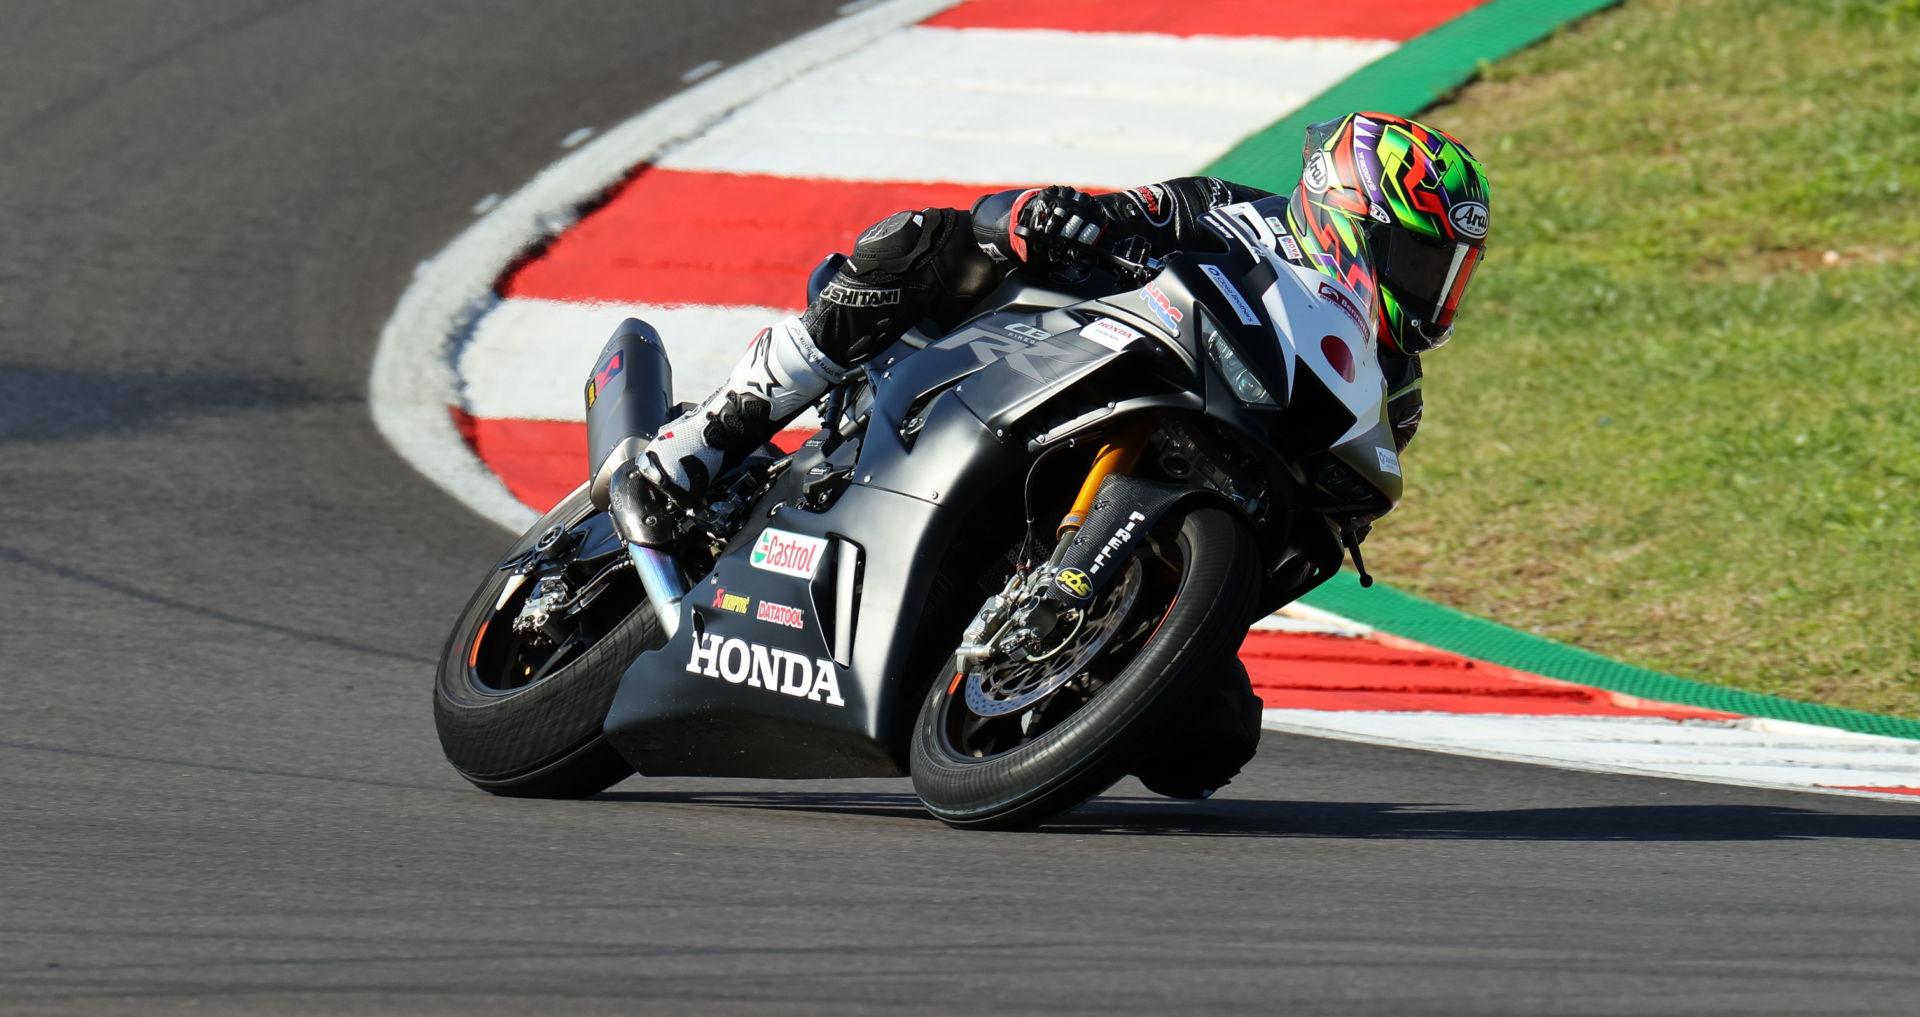 Ryo Mizuno during pre-season testing in Portugal. Photo courtesy Honda Racing.